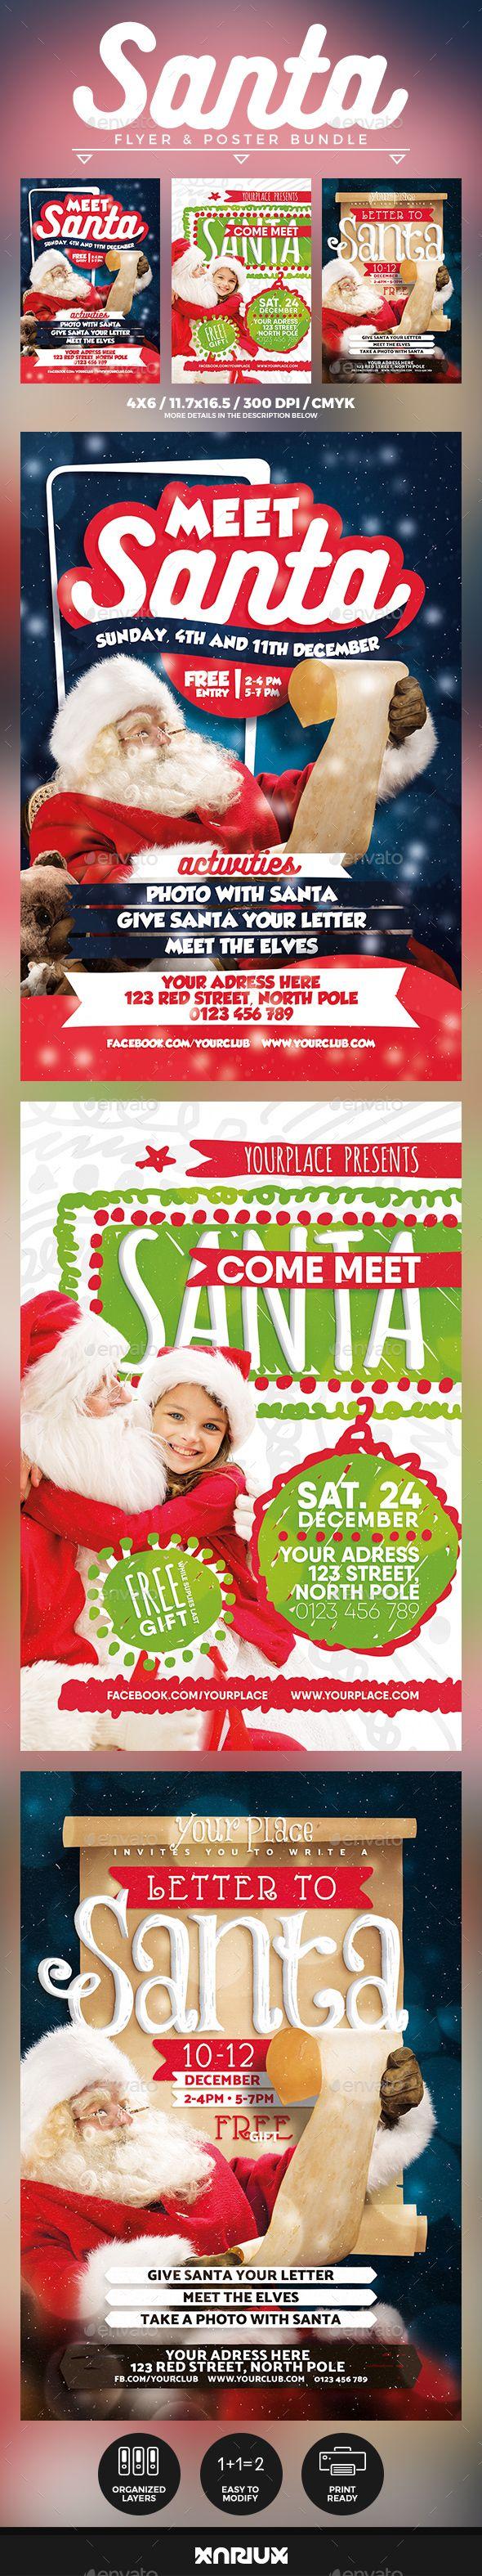 Meet Santa Flyer & Poster Bundle Template